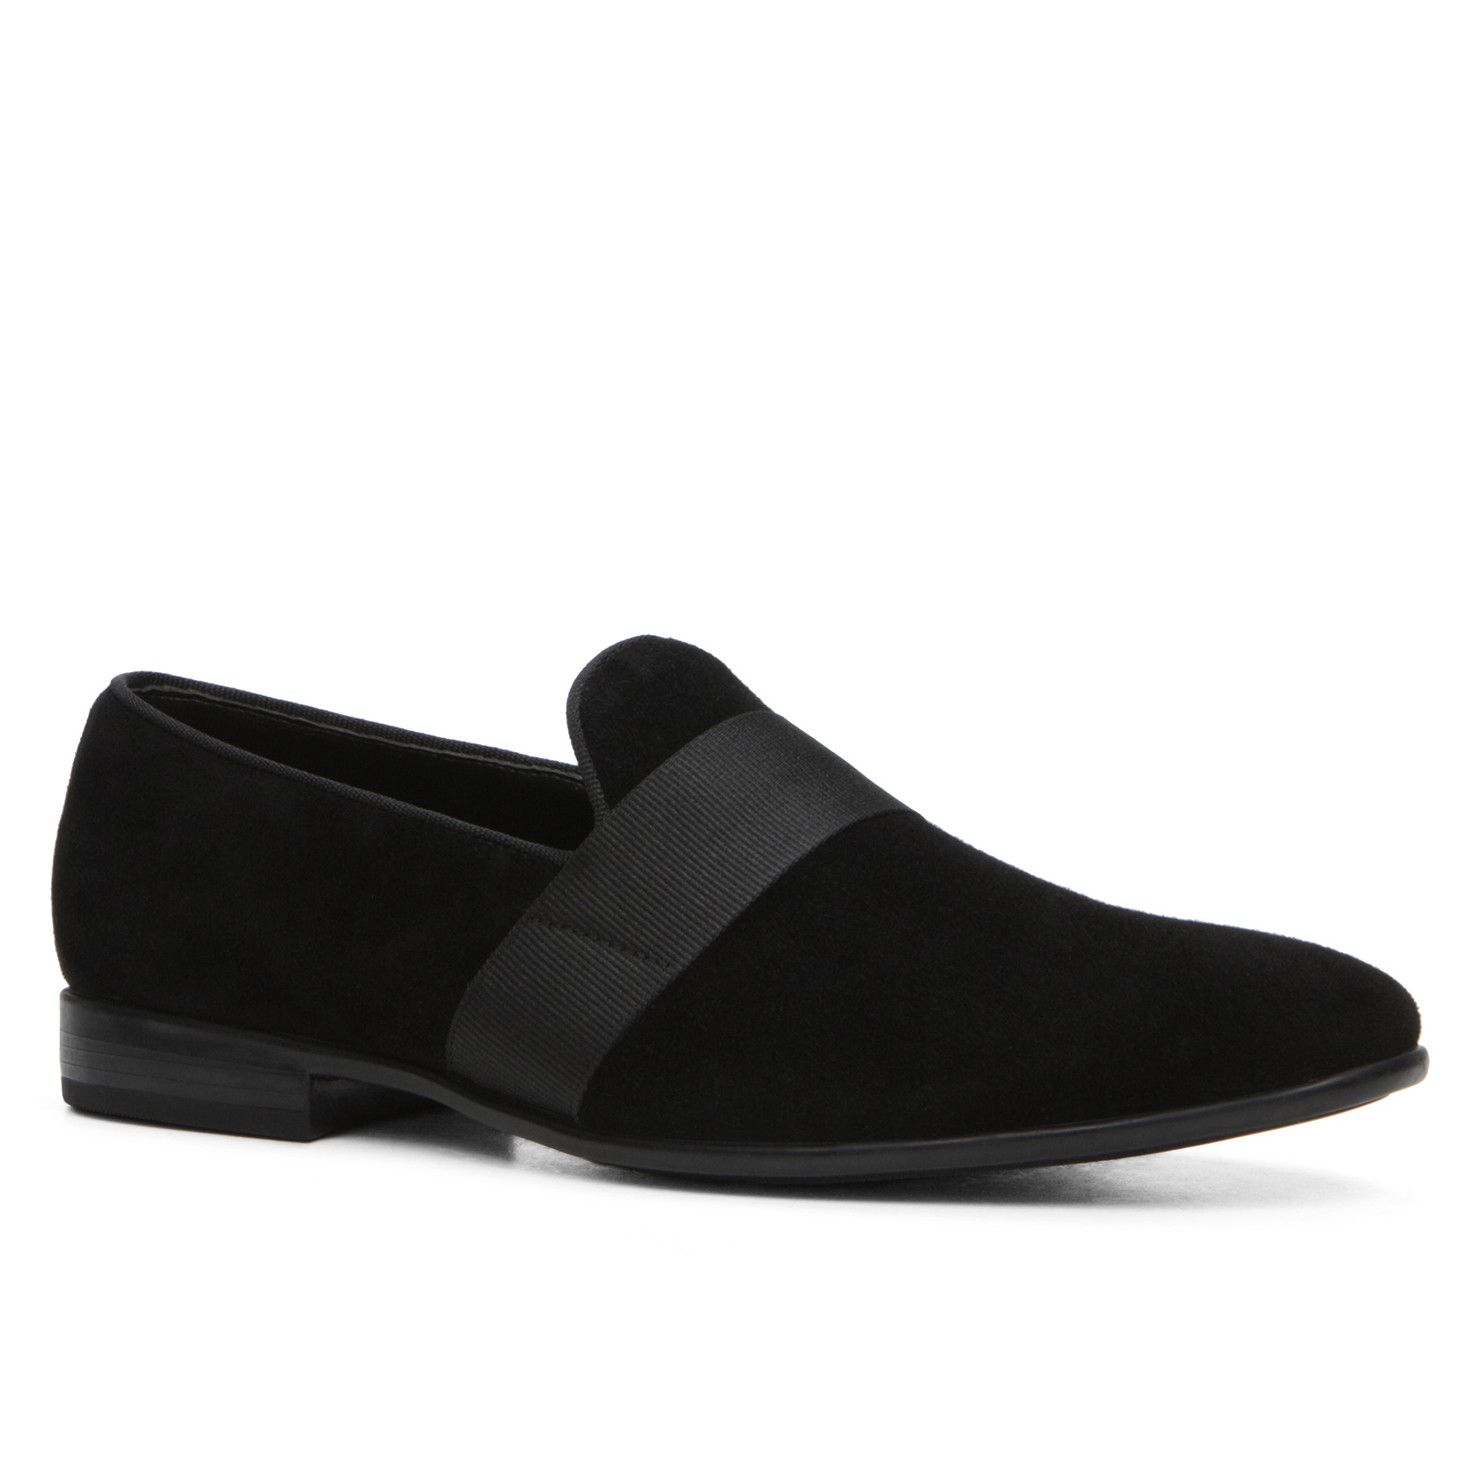 aldo black formal shoes